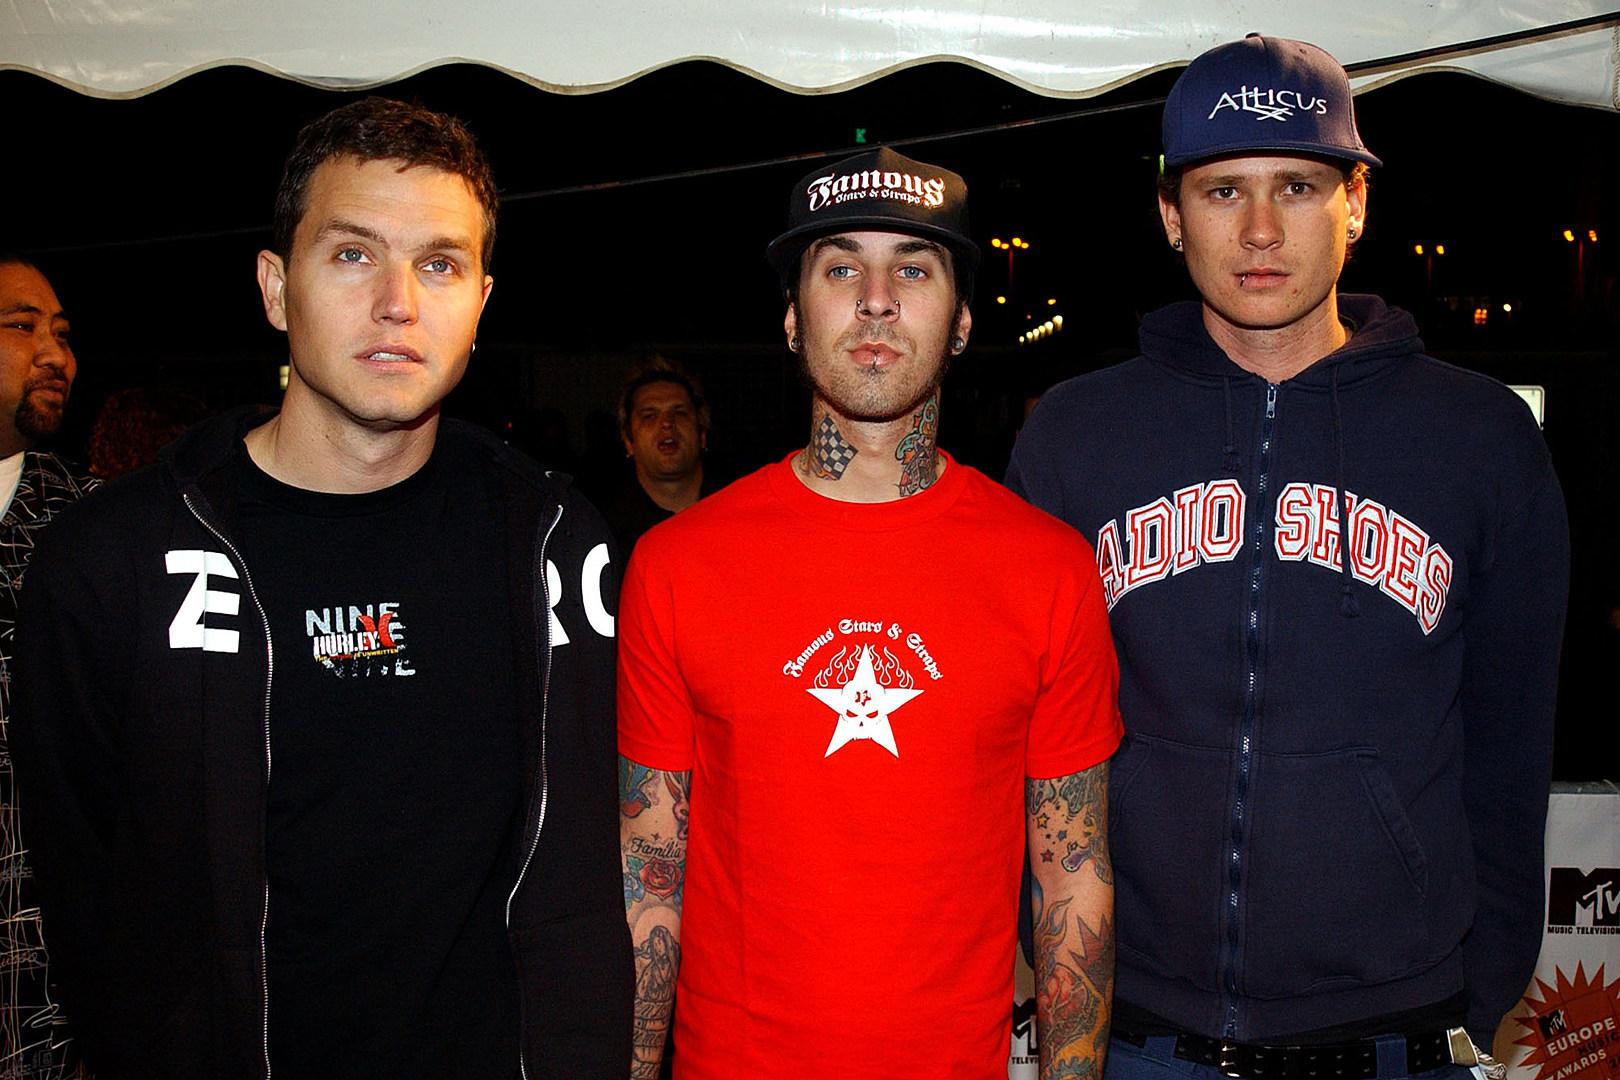 Will Blink-182 Ever Reunite With Tom DeLonge?